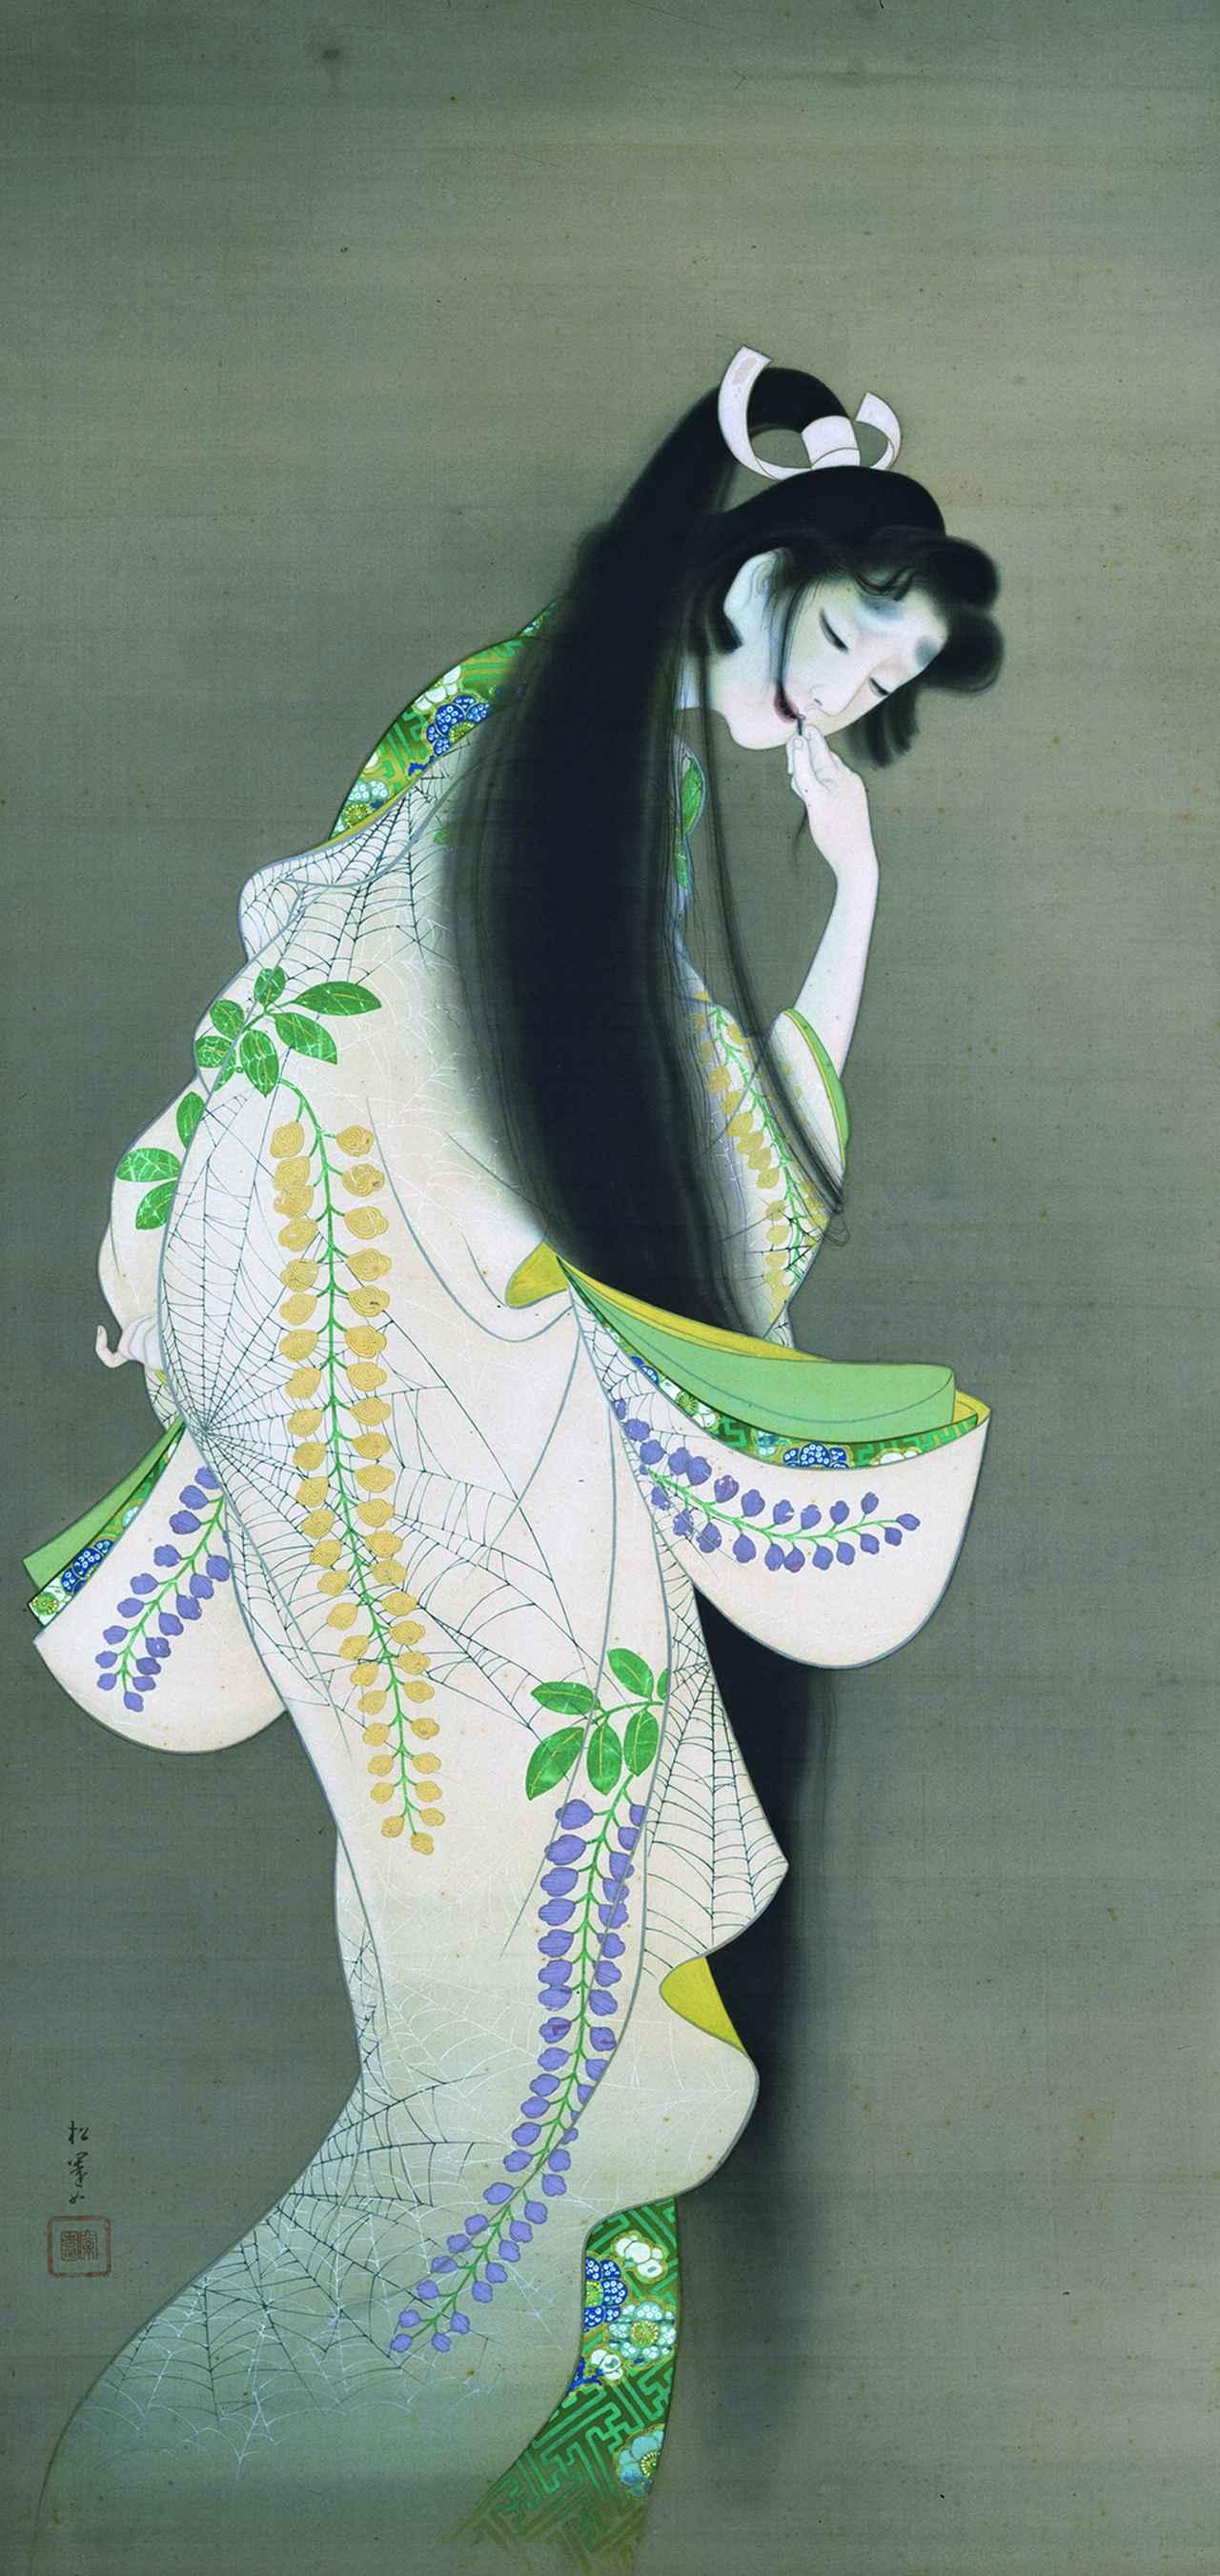 画像: 上村松園 《焰》 大正7(1918)年、東京国立博物館、東京展のみ、3月23日~4月4日